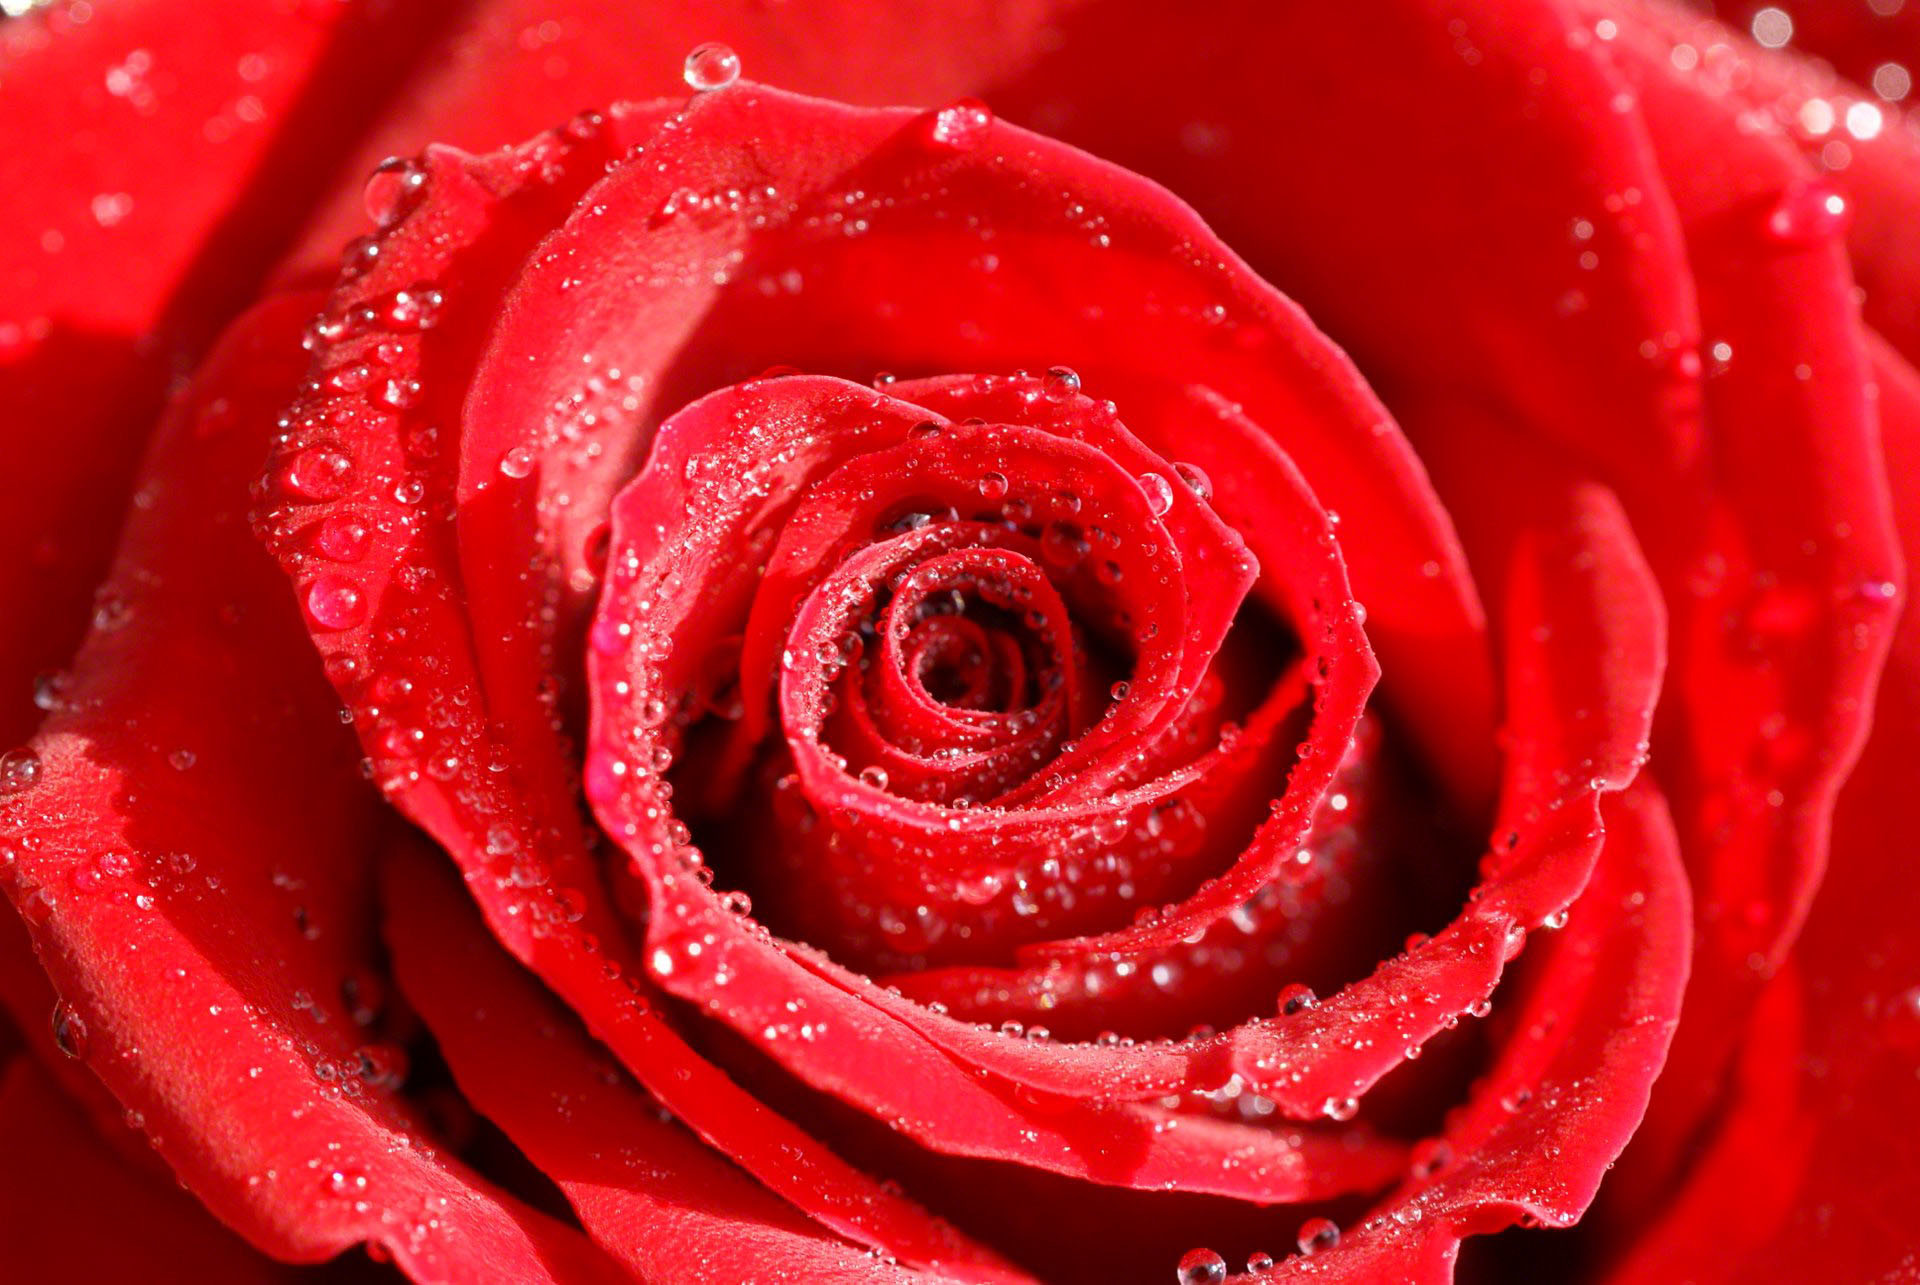 Rose flower wallpaper hd wallpapertag - Hd flower wallpaper rose ...